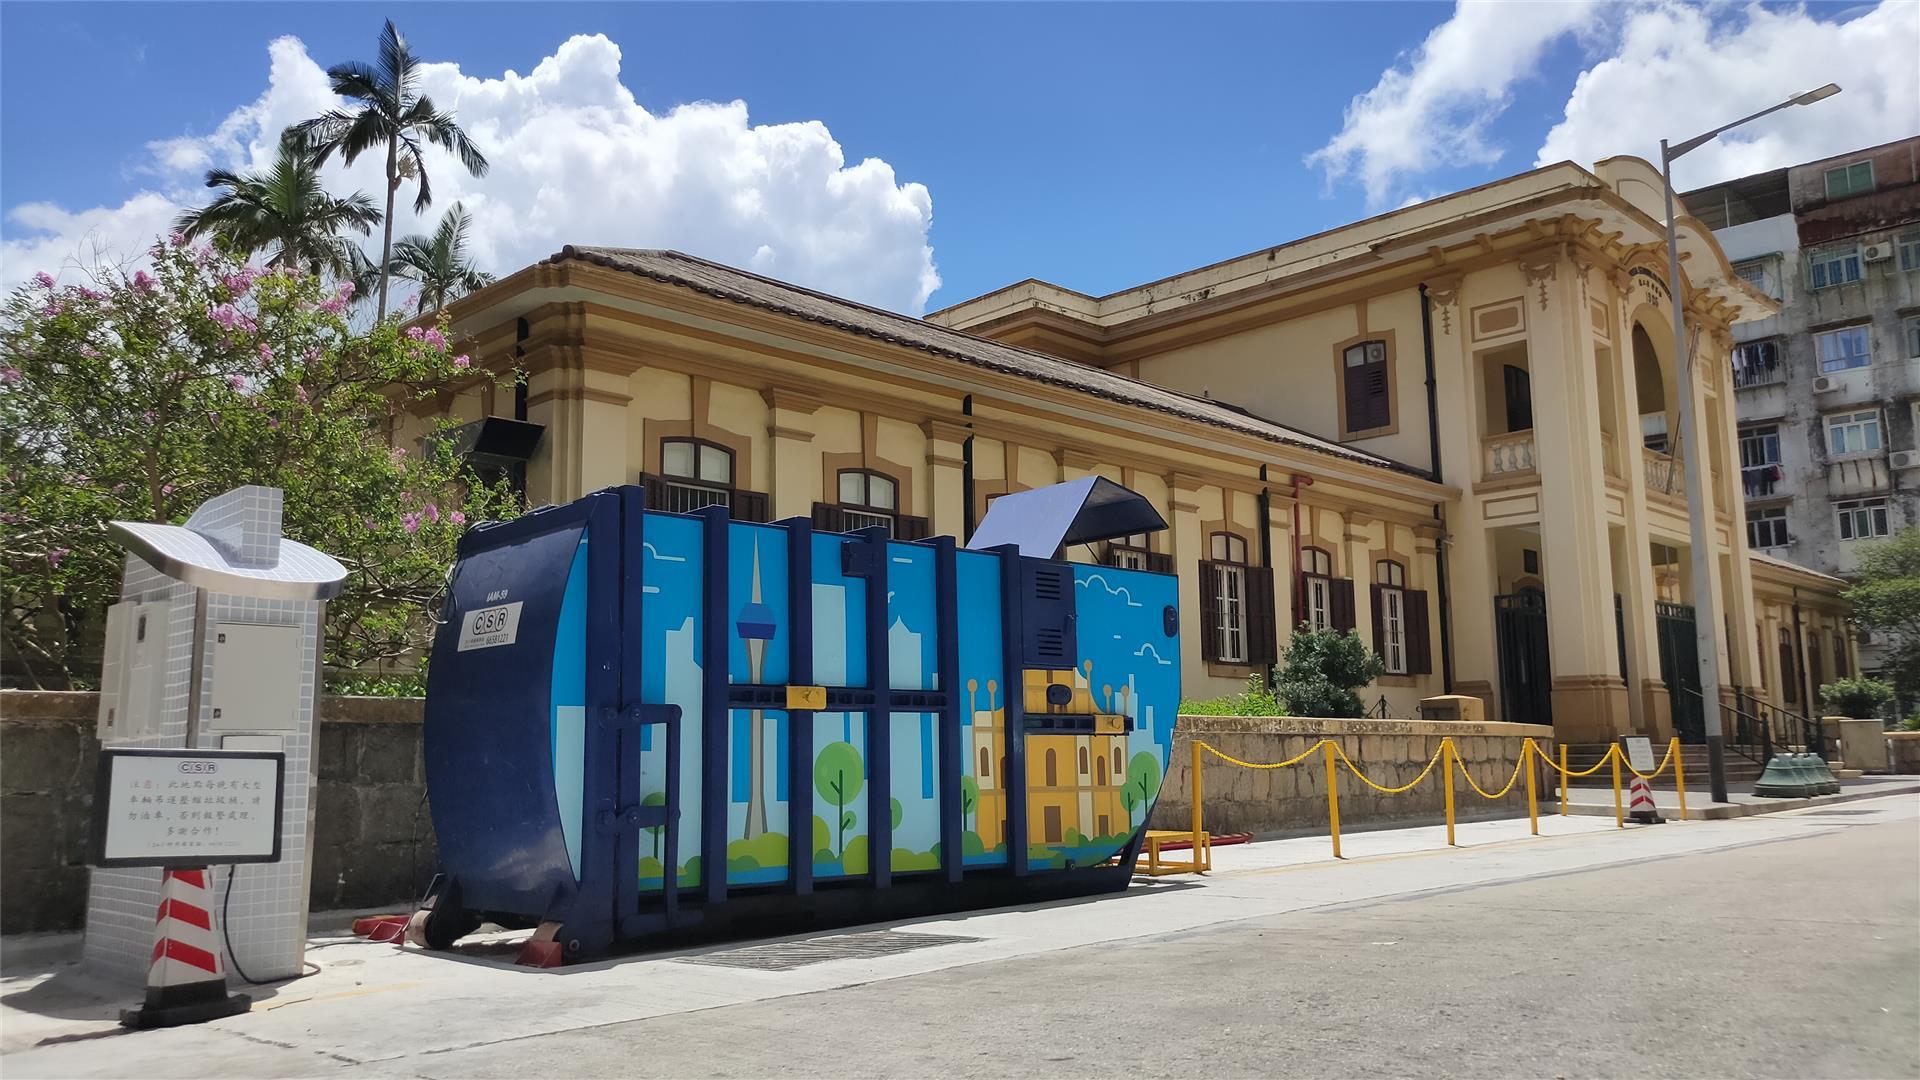 M81 Compacting trash bin at  Opposite Largo da Companhia No. 12